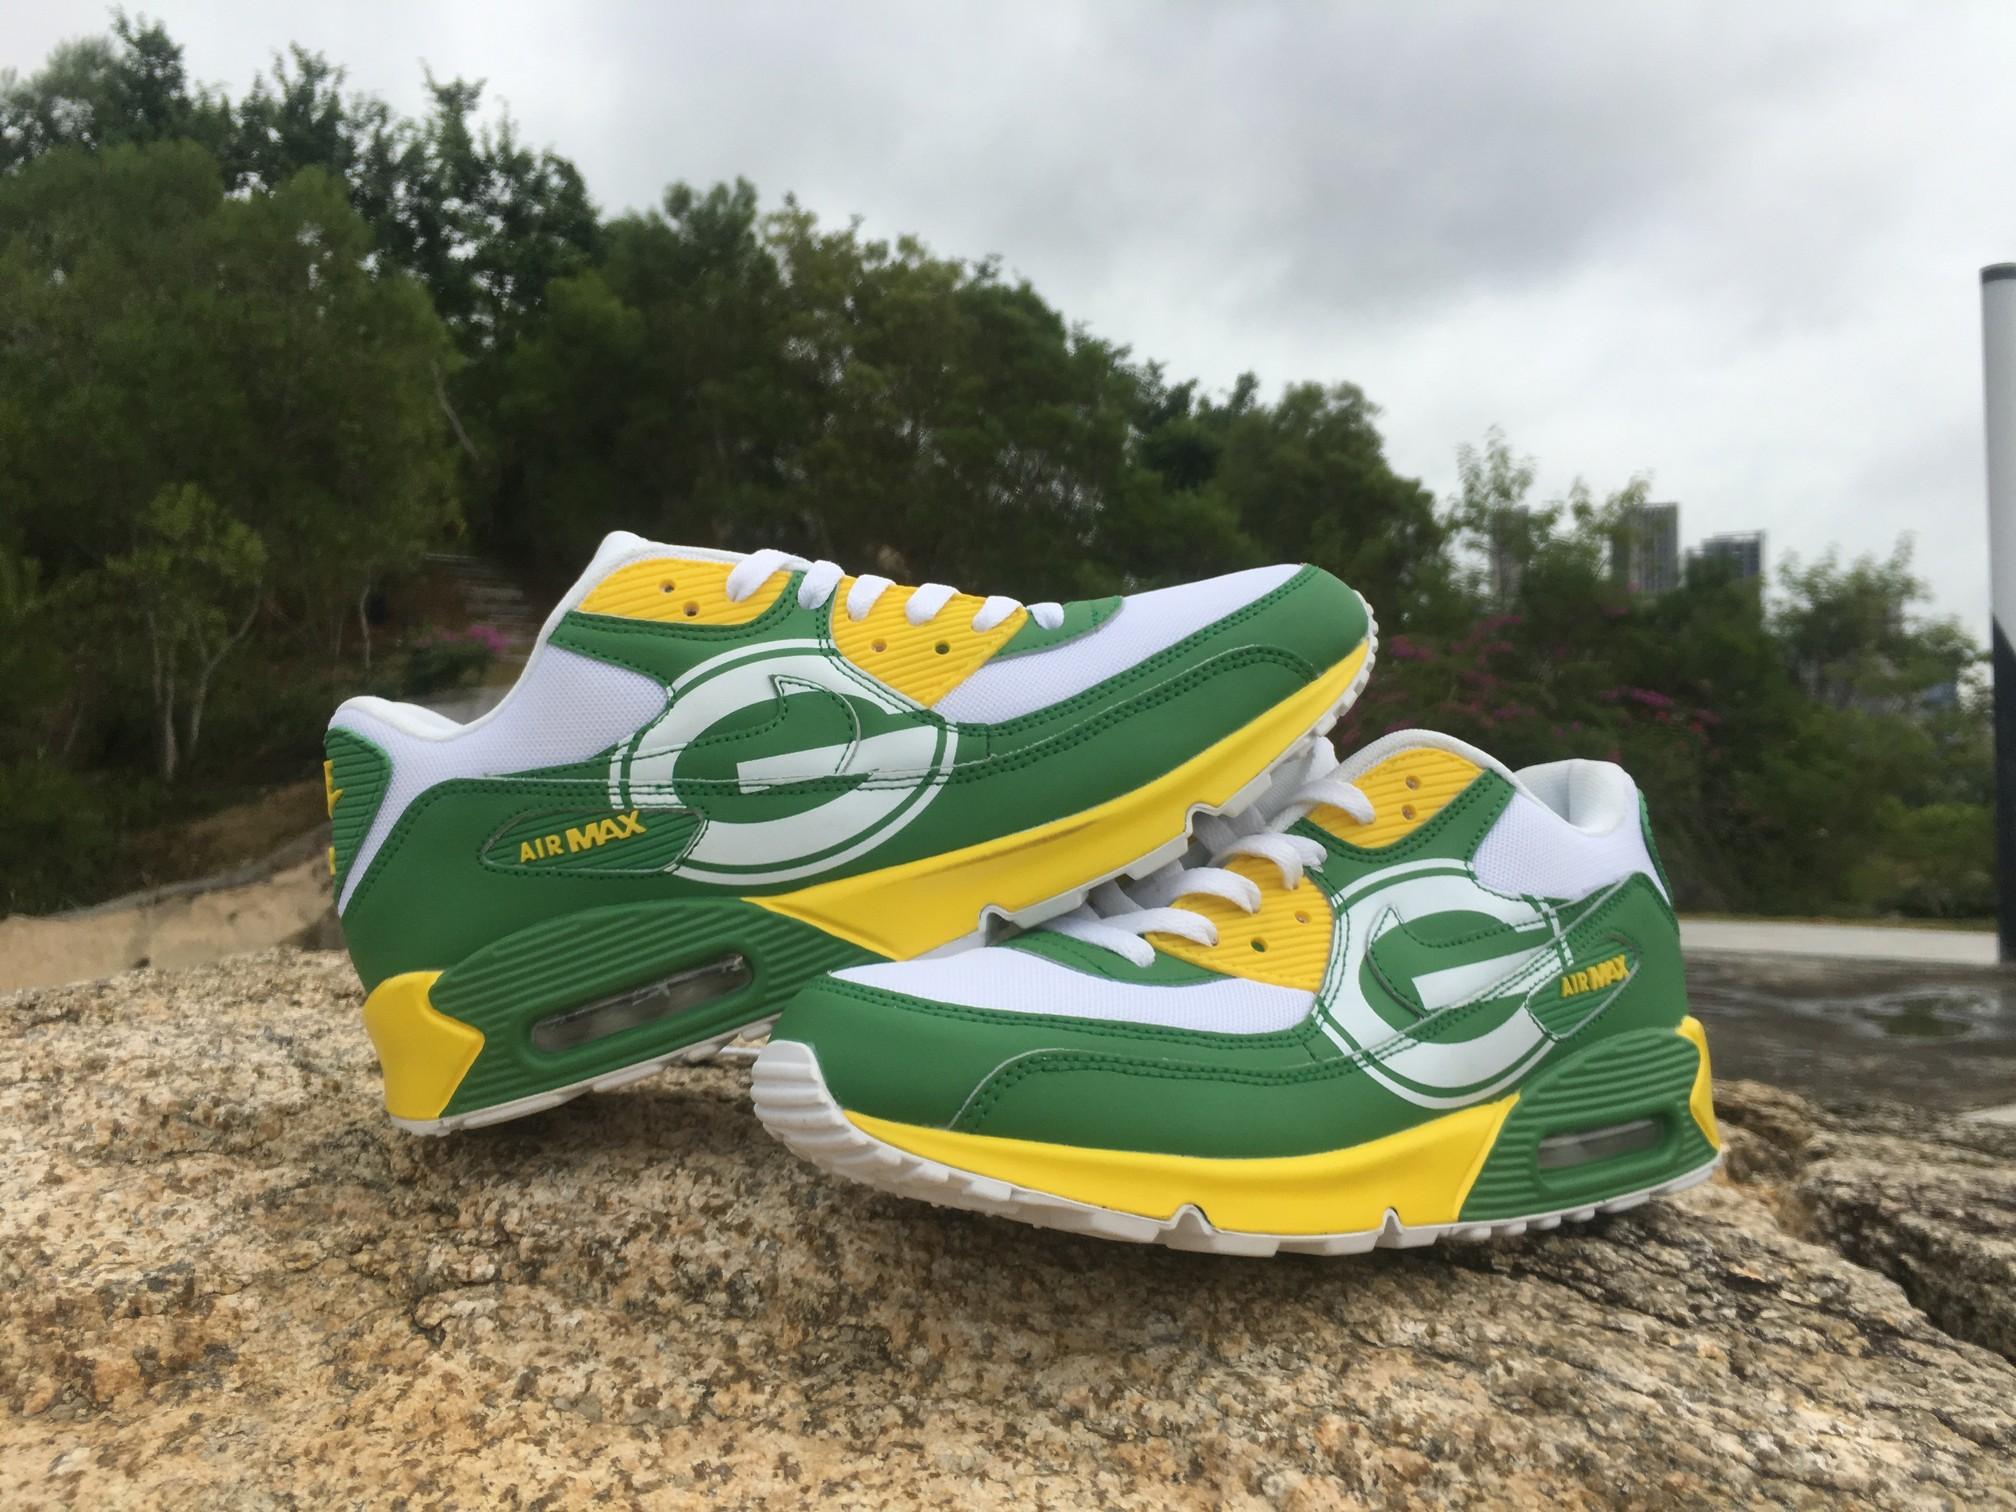 new style 458b4 ac652 ... Jordan (FREE SHIPPING) Men Green Bay Packers Custom Nike Air Max 90  Shoes Sneakers Item ...